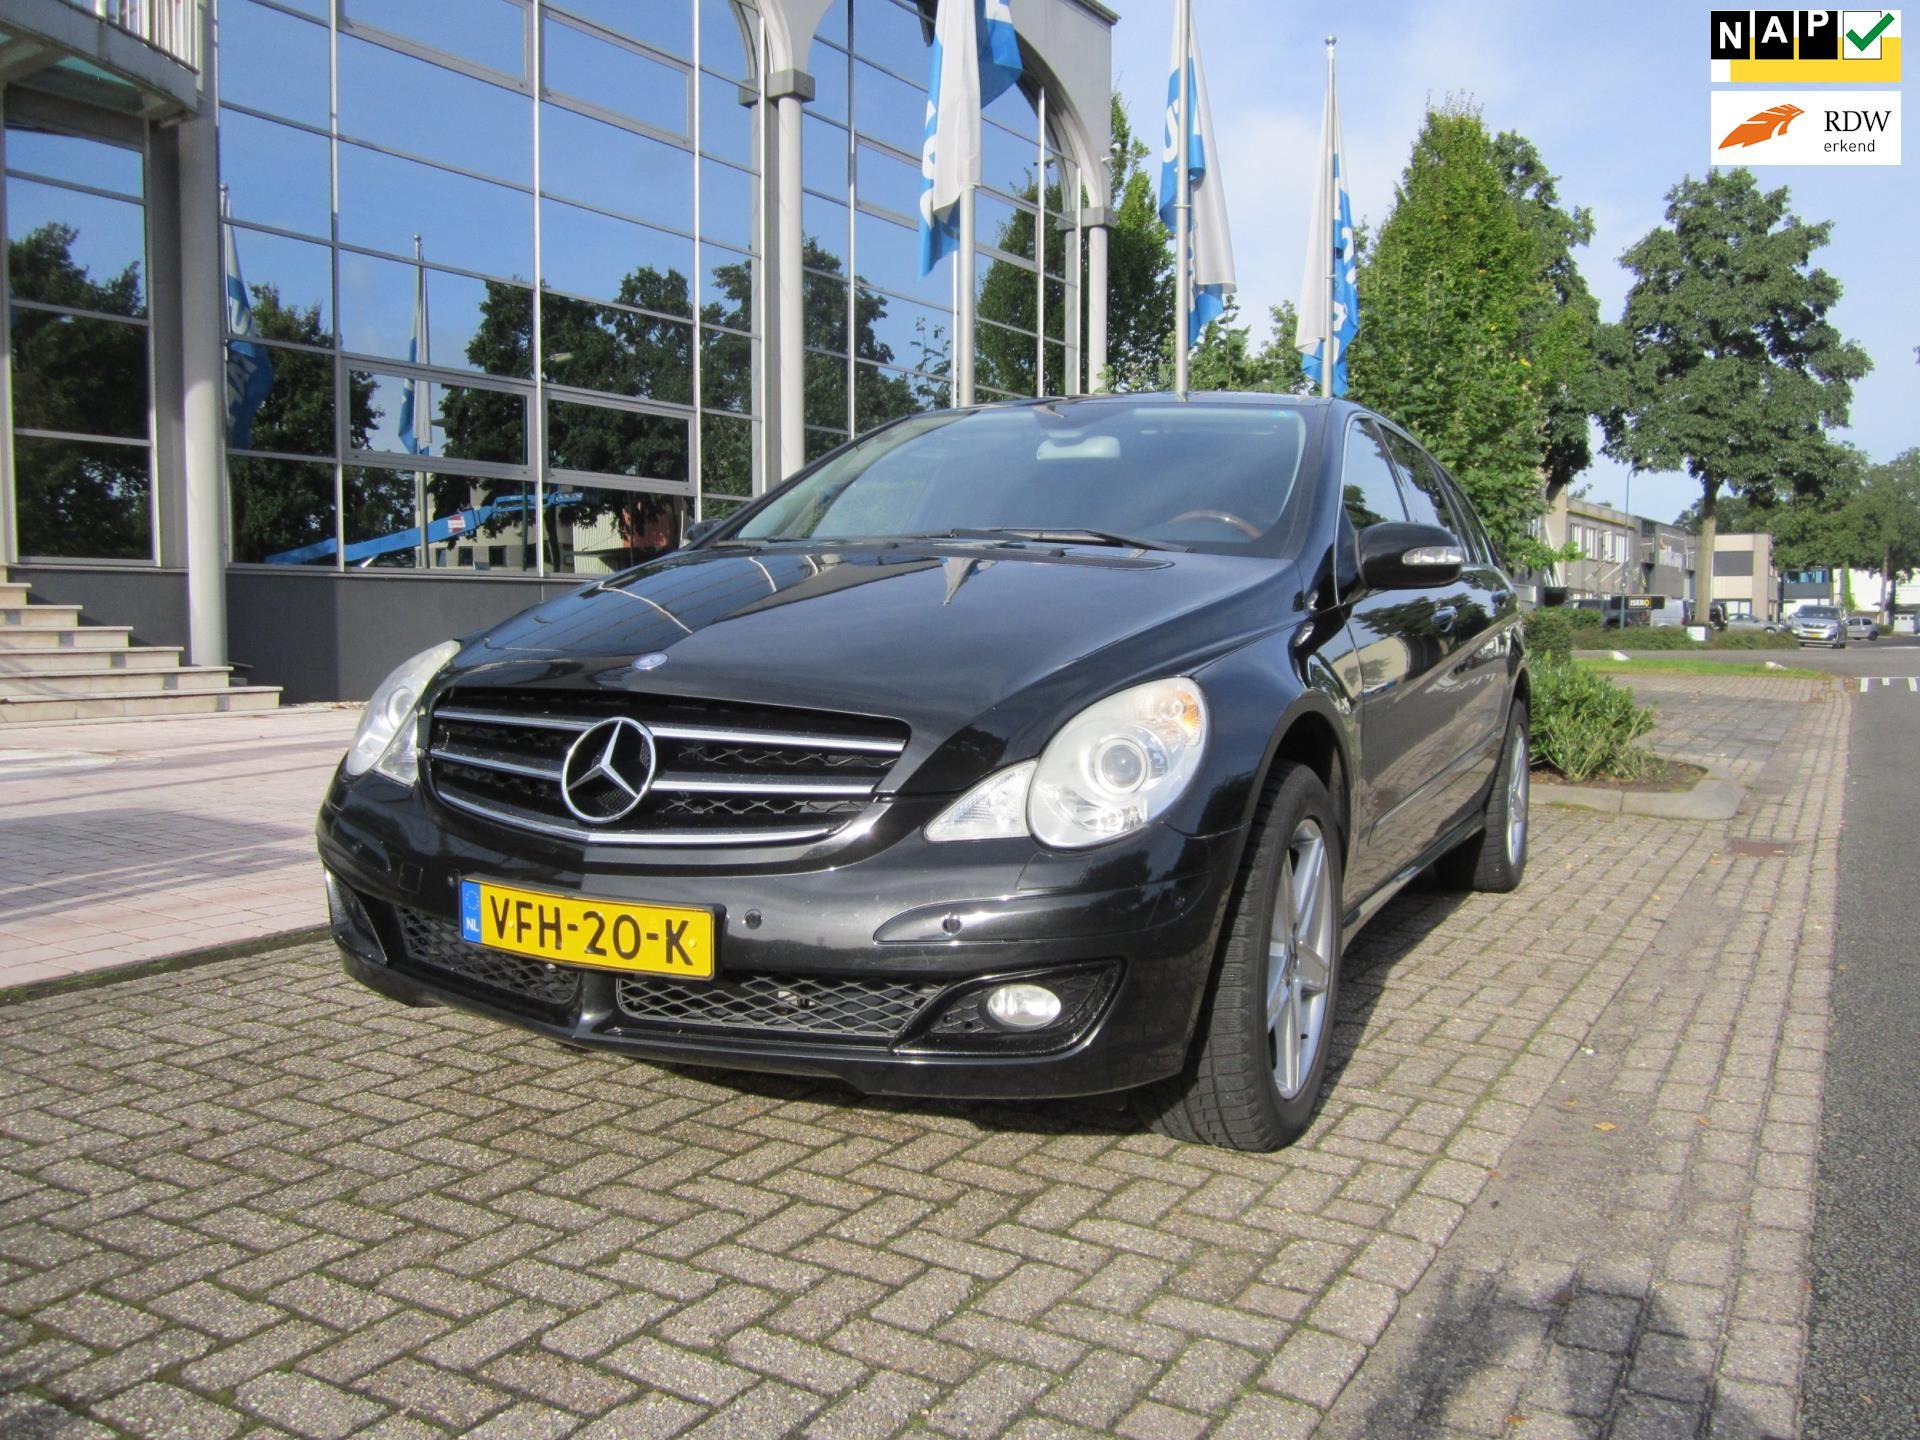 Mercedes-Benz R 320 CDI 4MATIC occasion - HG Auto's